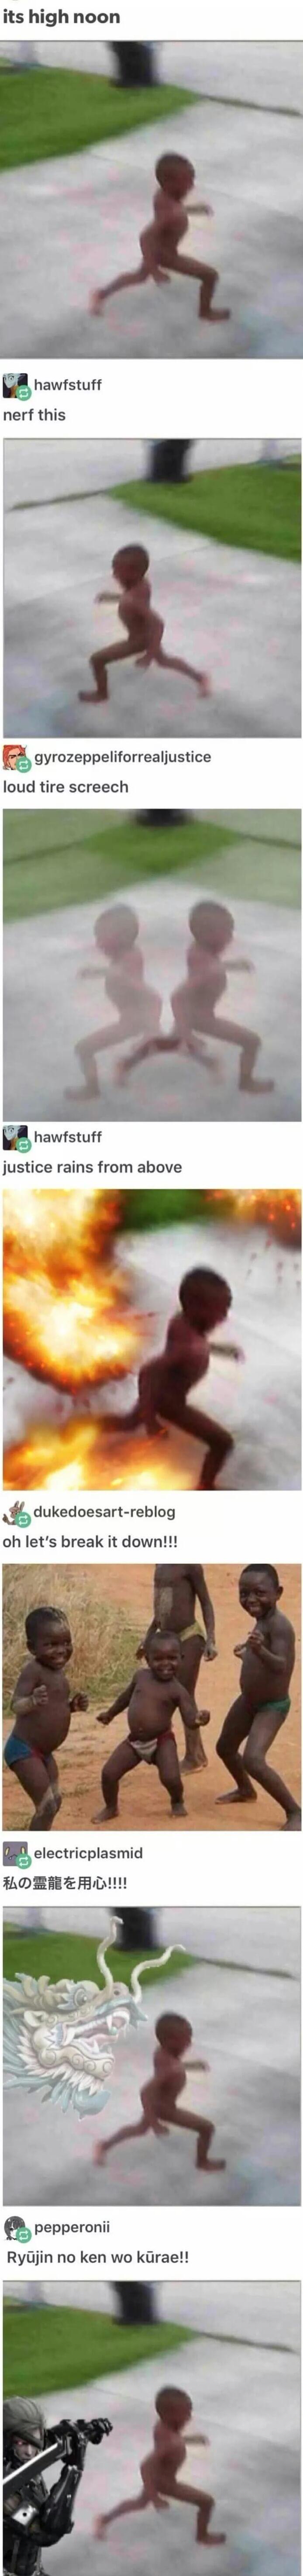 Run-overwatch